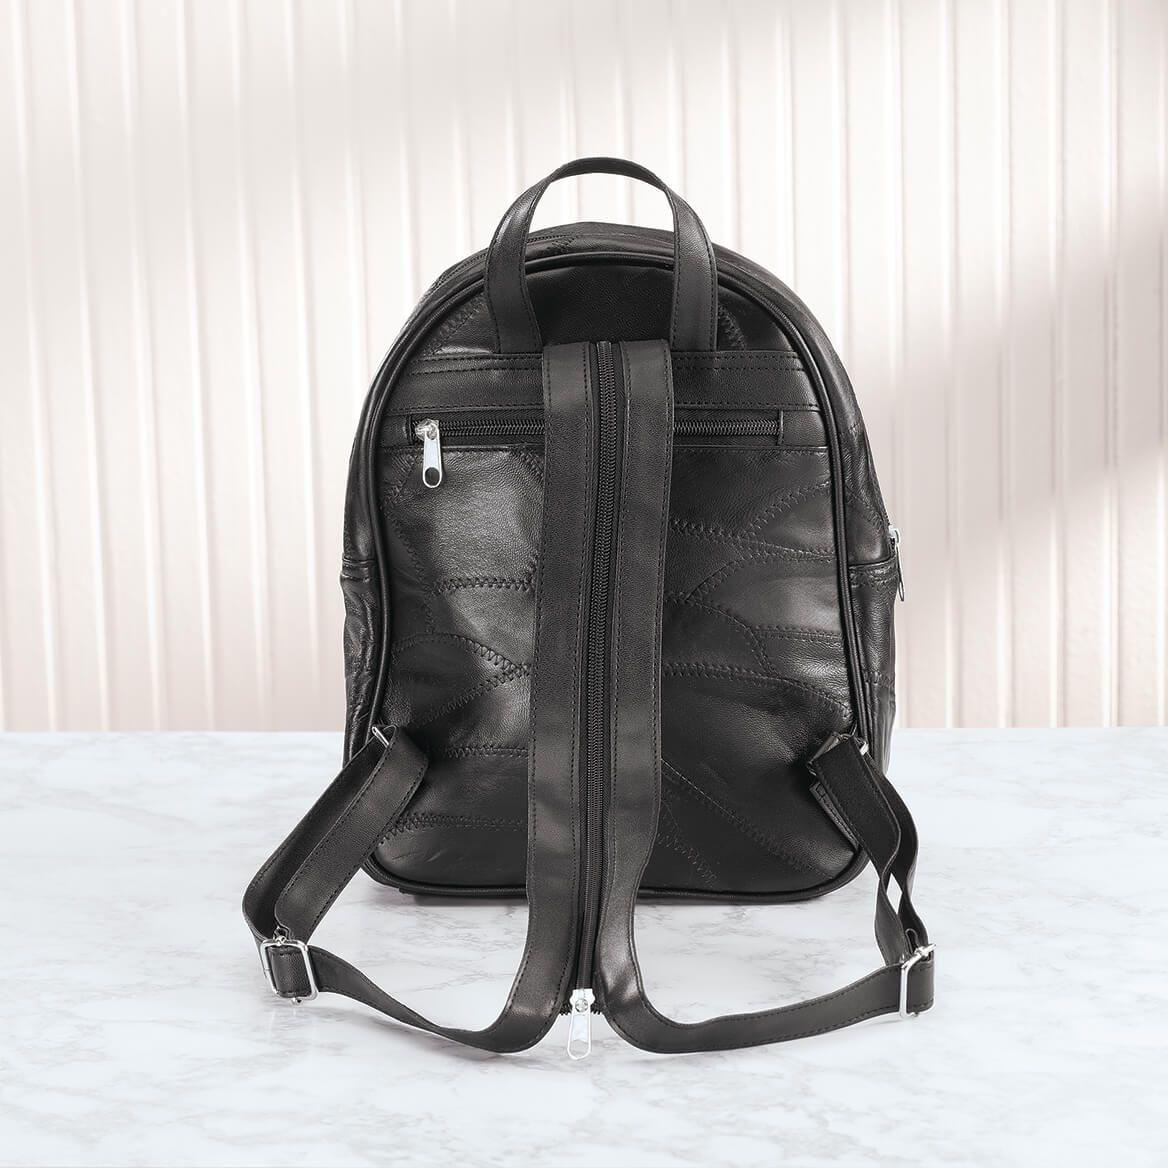 B.Amici™ Liz RFID Leather Backpack-367443